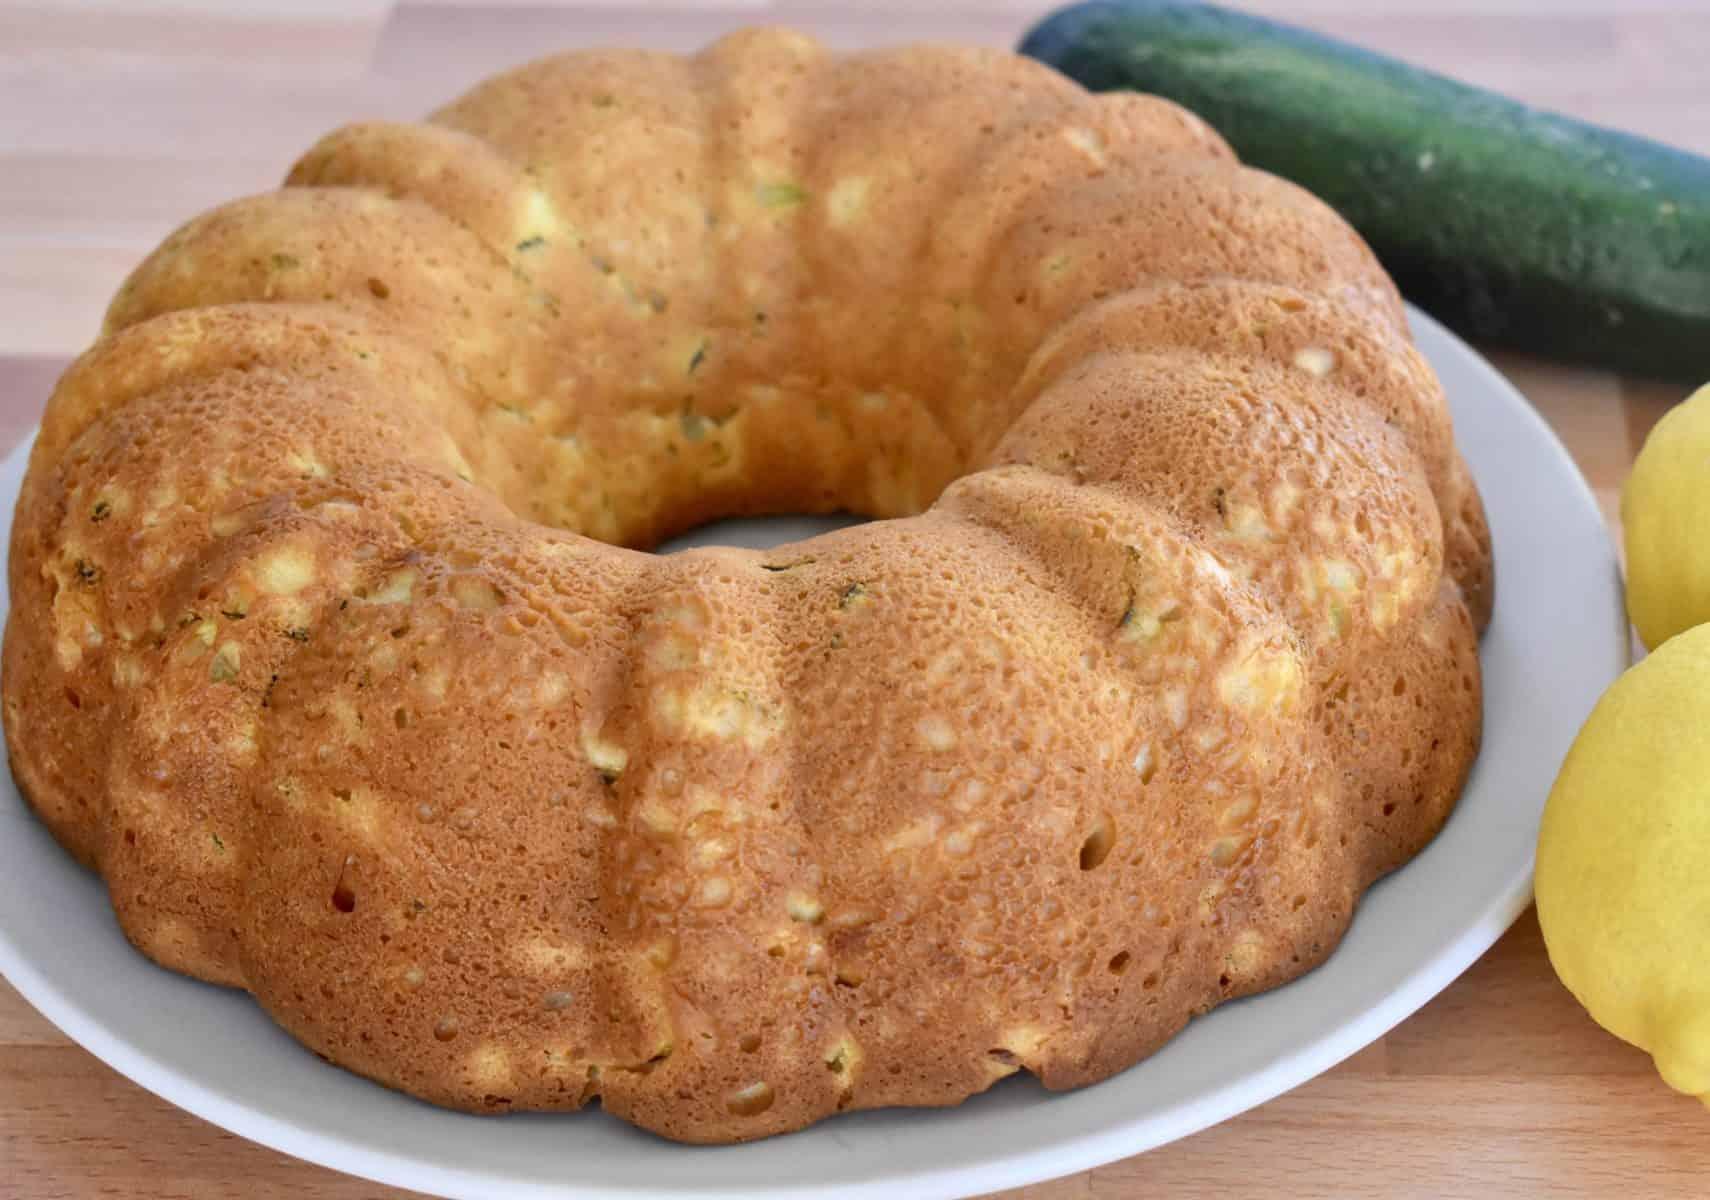 Zucchini Ricotta Cake on a plate with lemon and zucchini next to it.